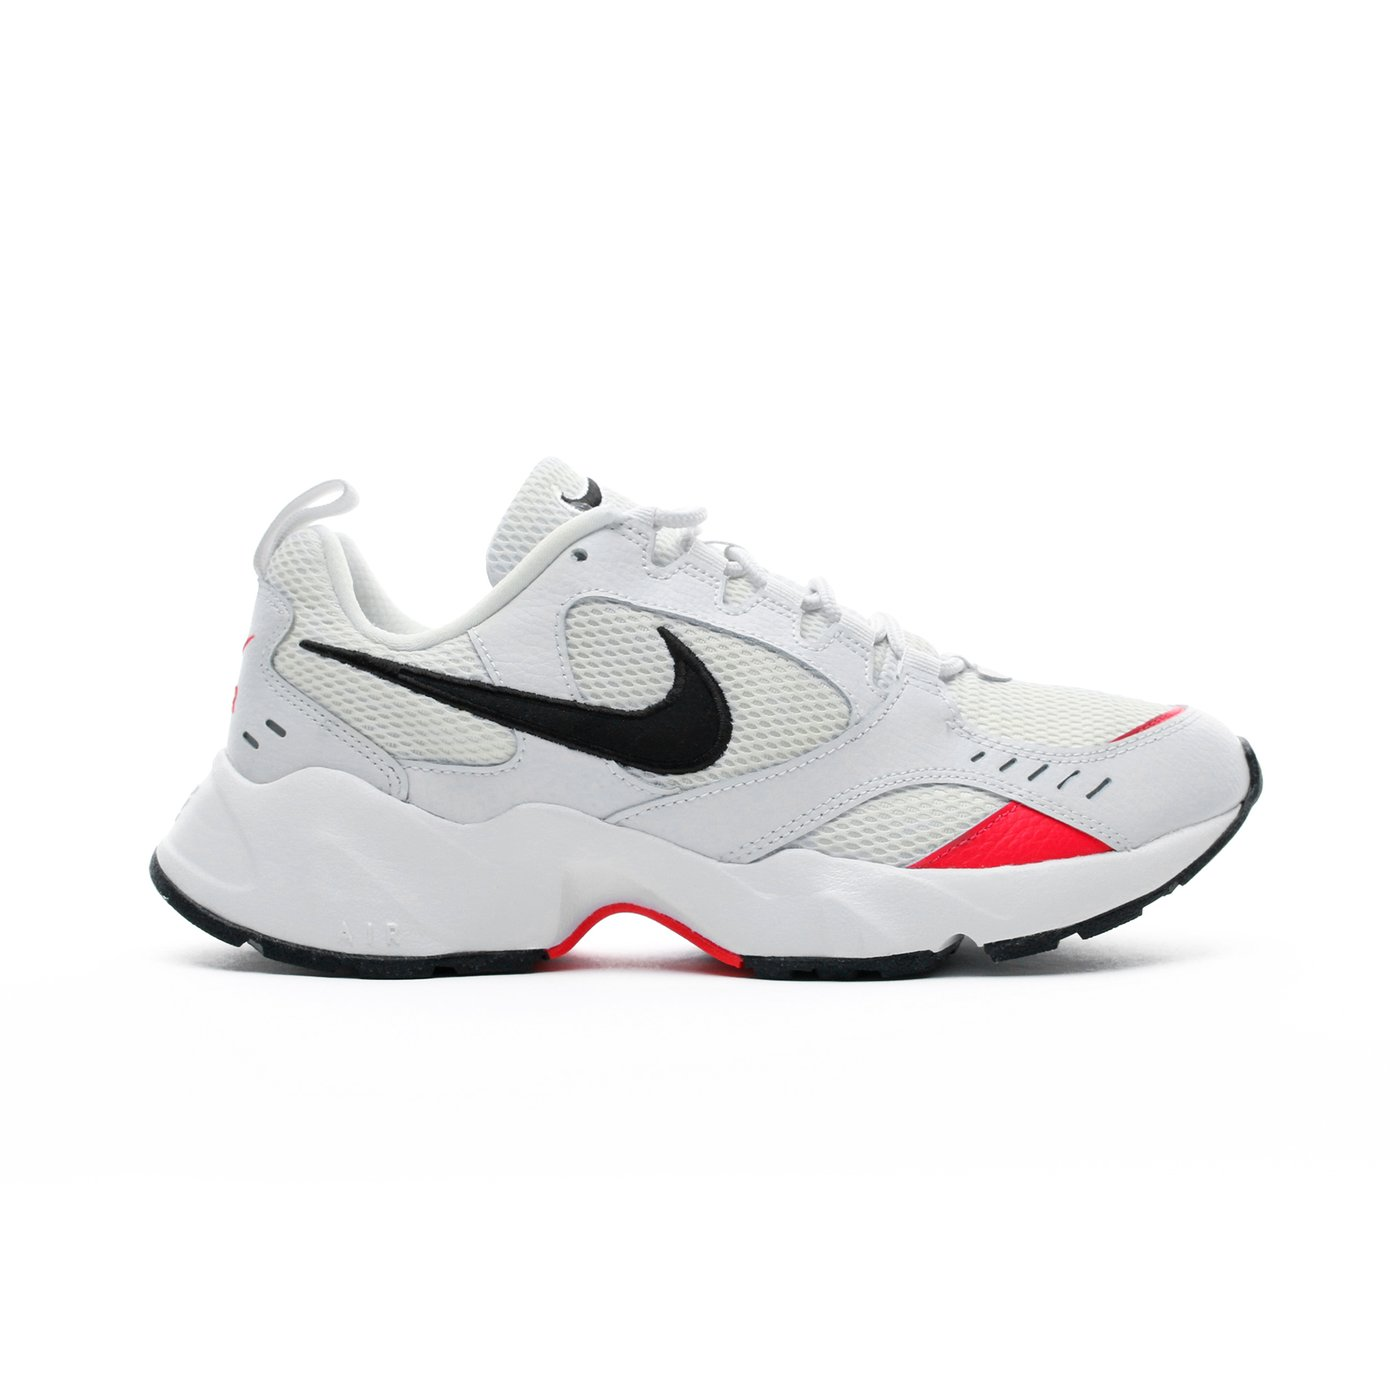 Nike Air Heights Beyaz Erkek Spor Ayakkabı